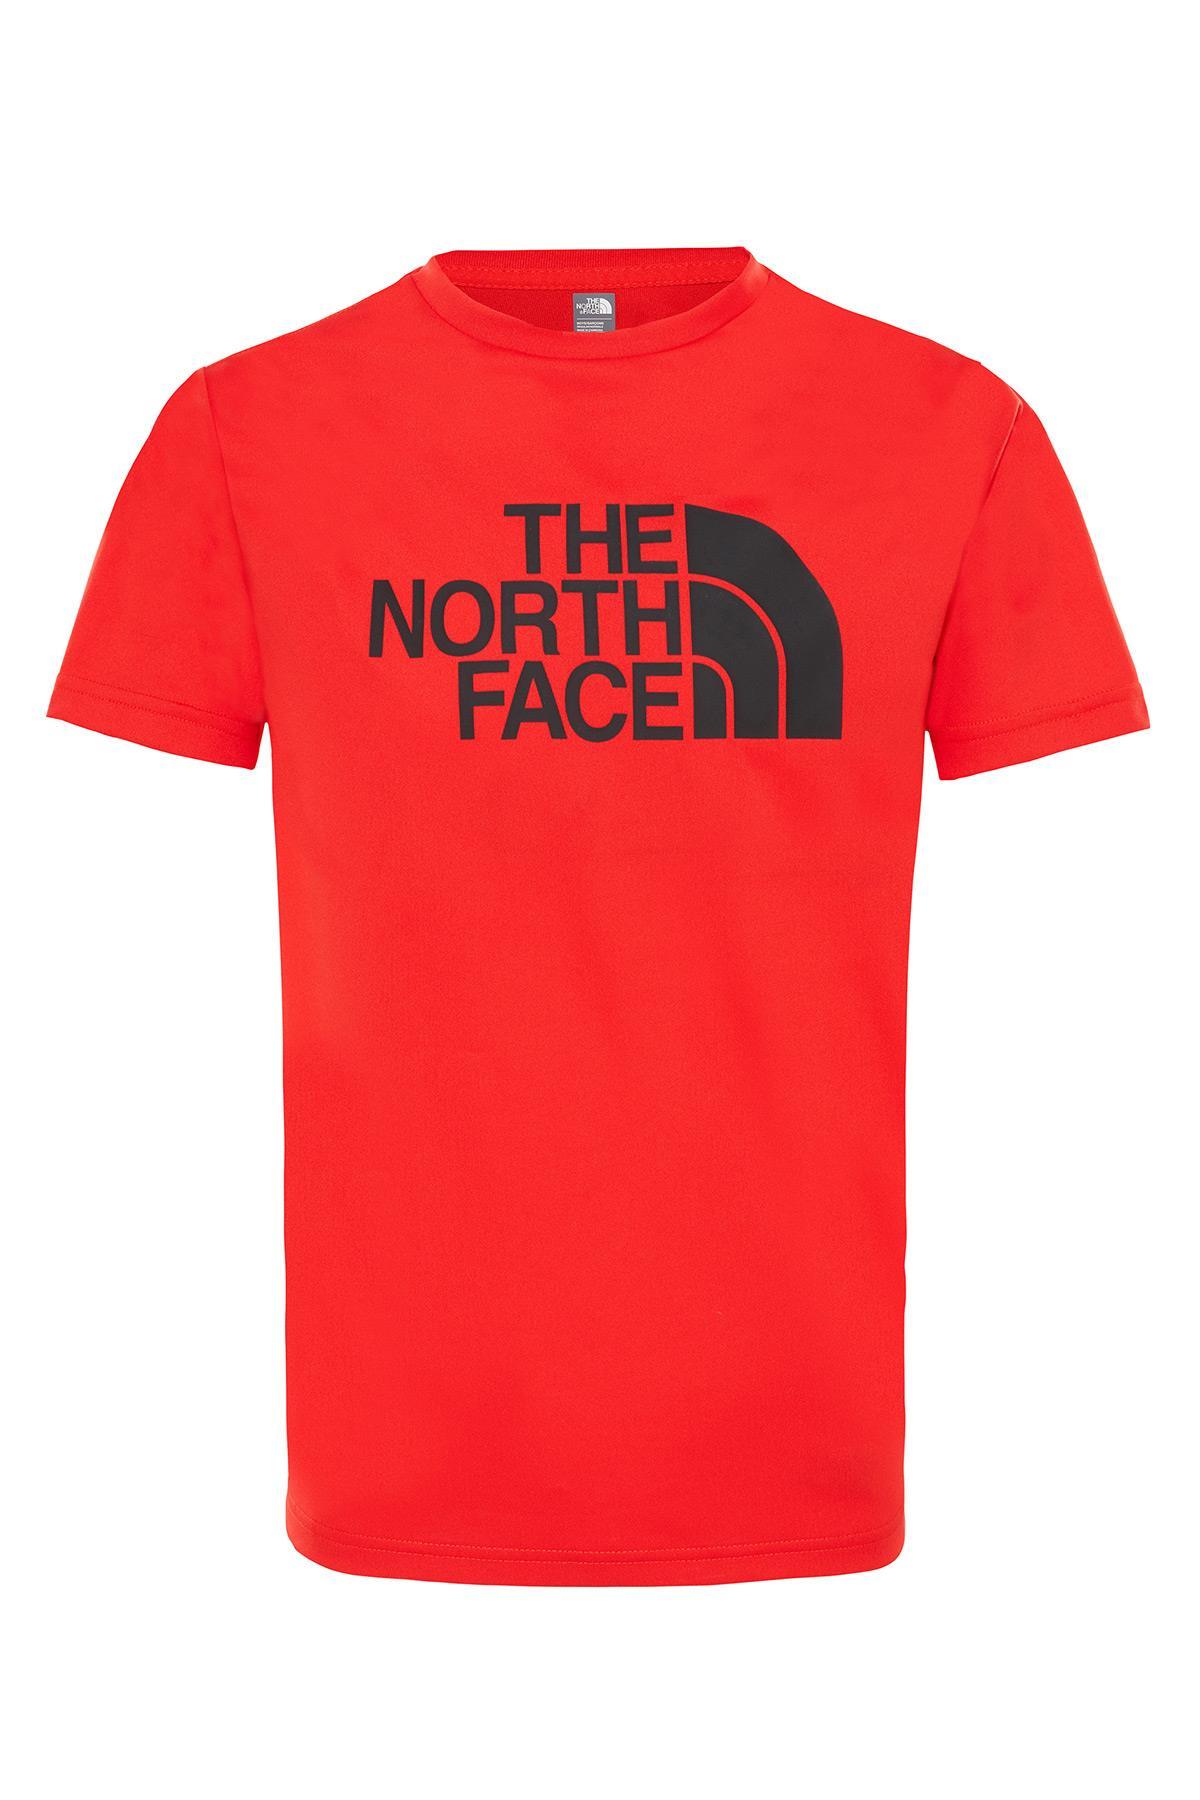 The Northface B S/S Reaxion 2.0 Tee T93S3515Q Tişört